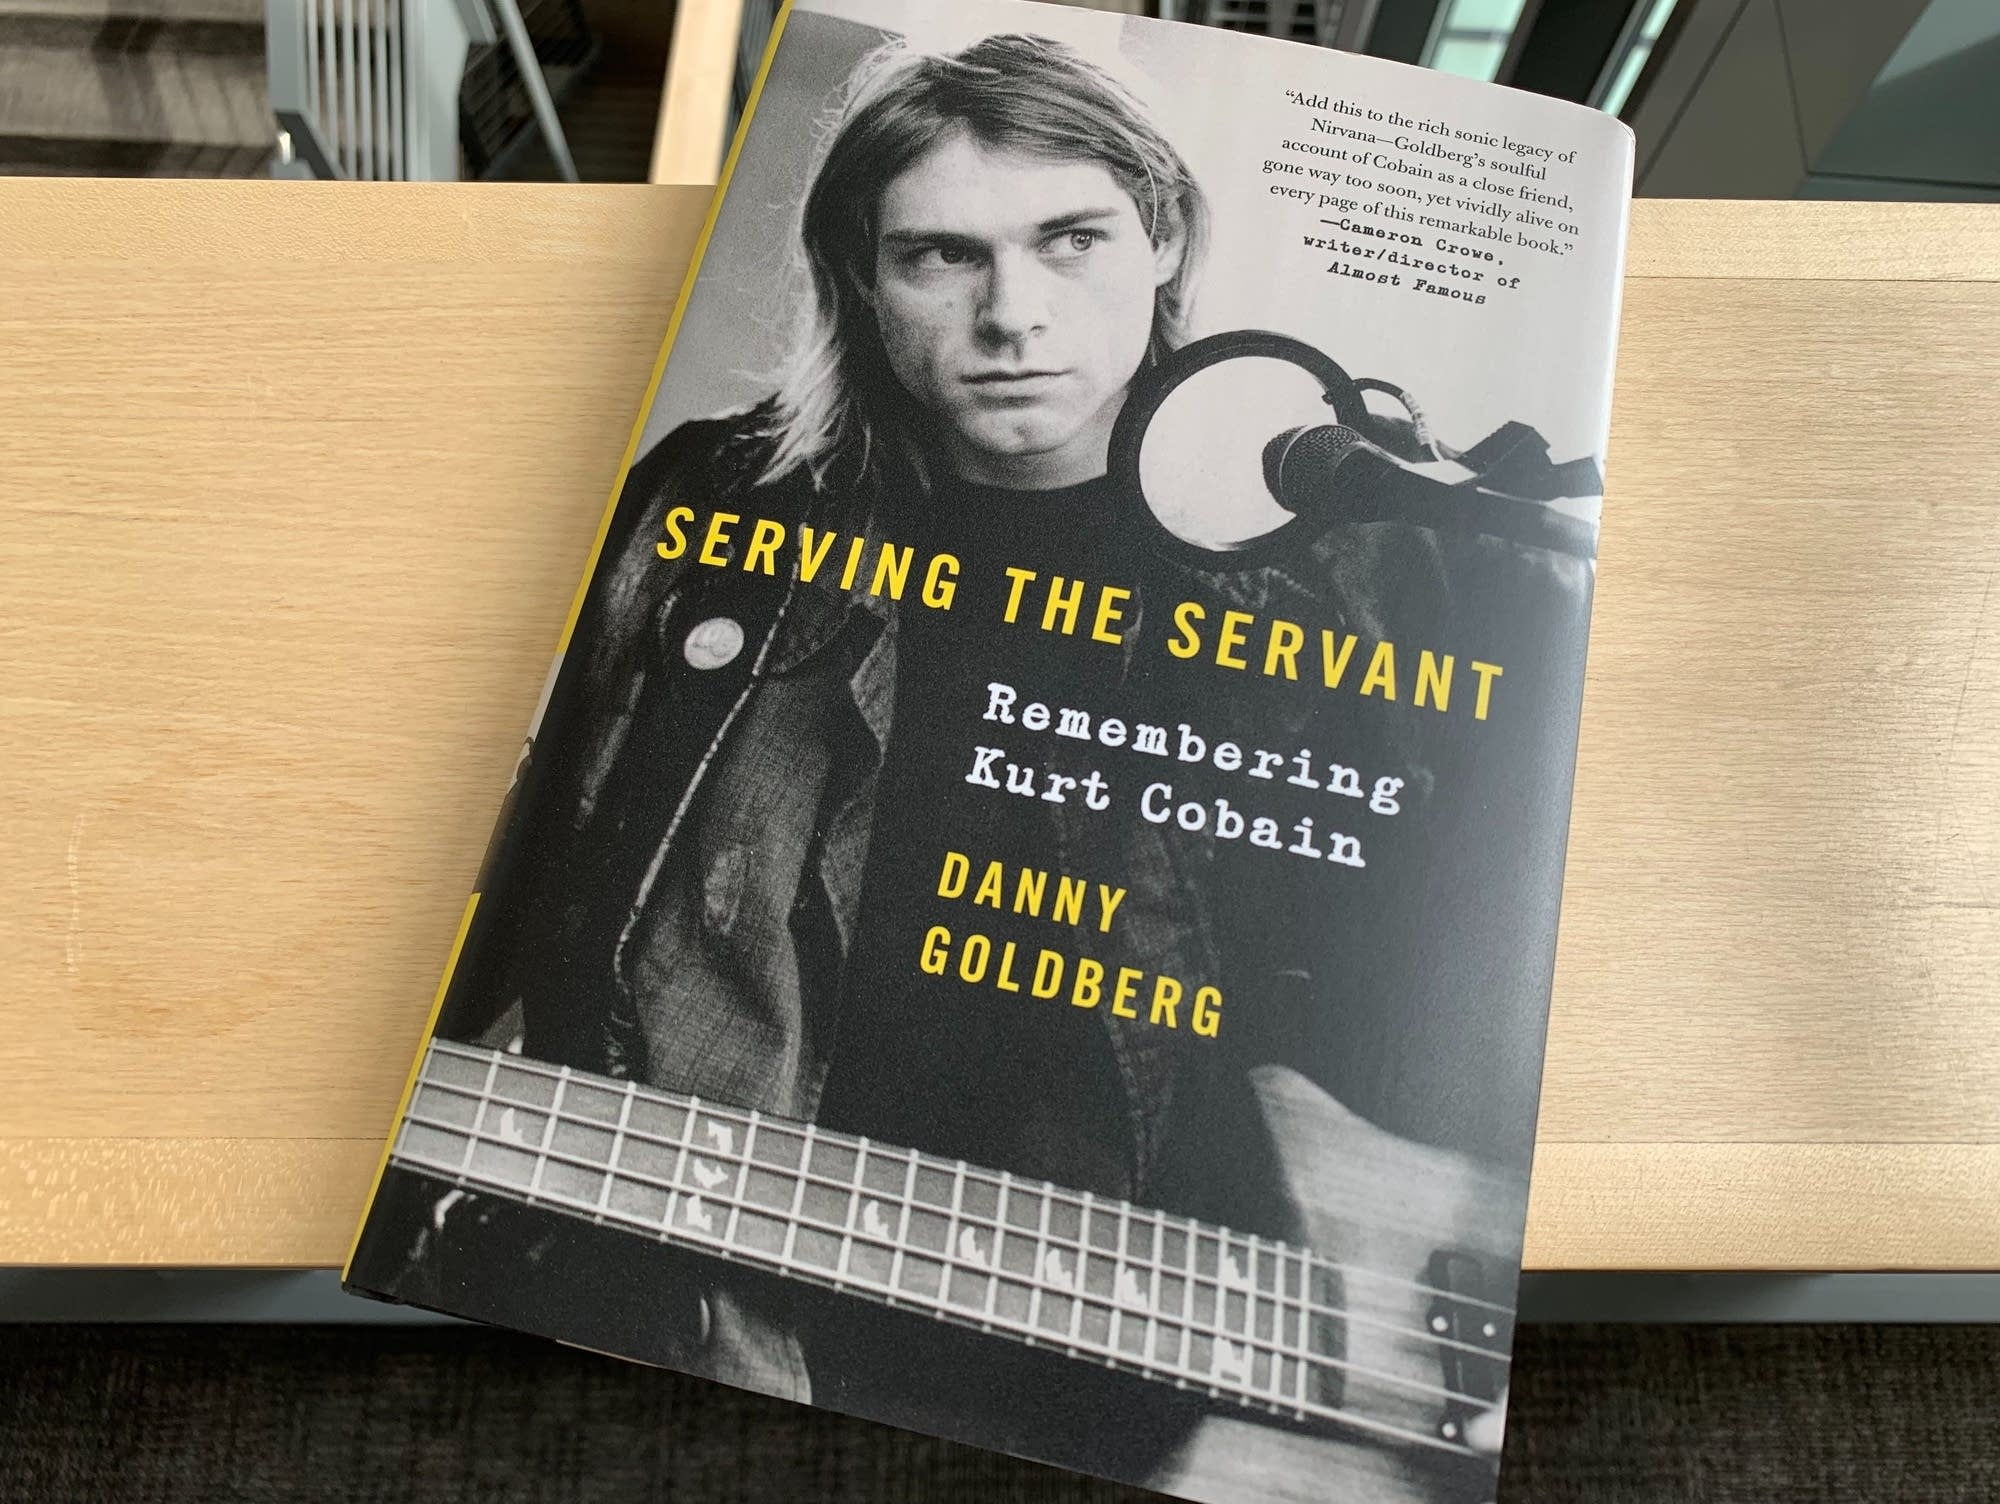 Danny Goldberg's 'Serving the Servant.'